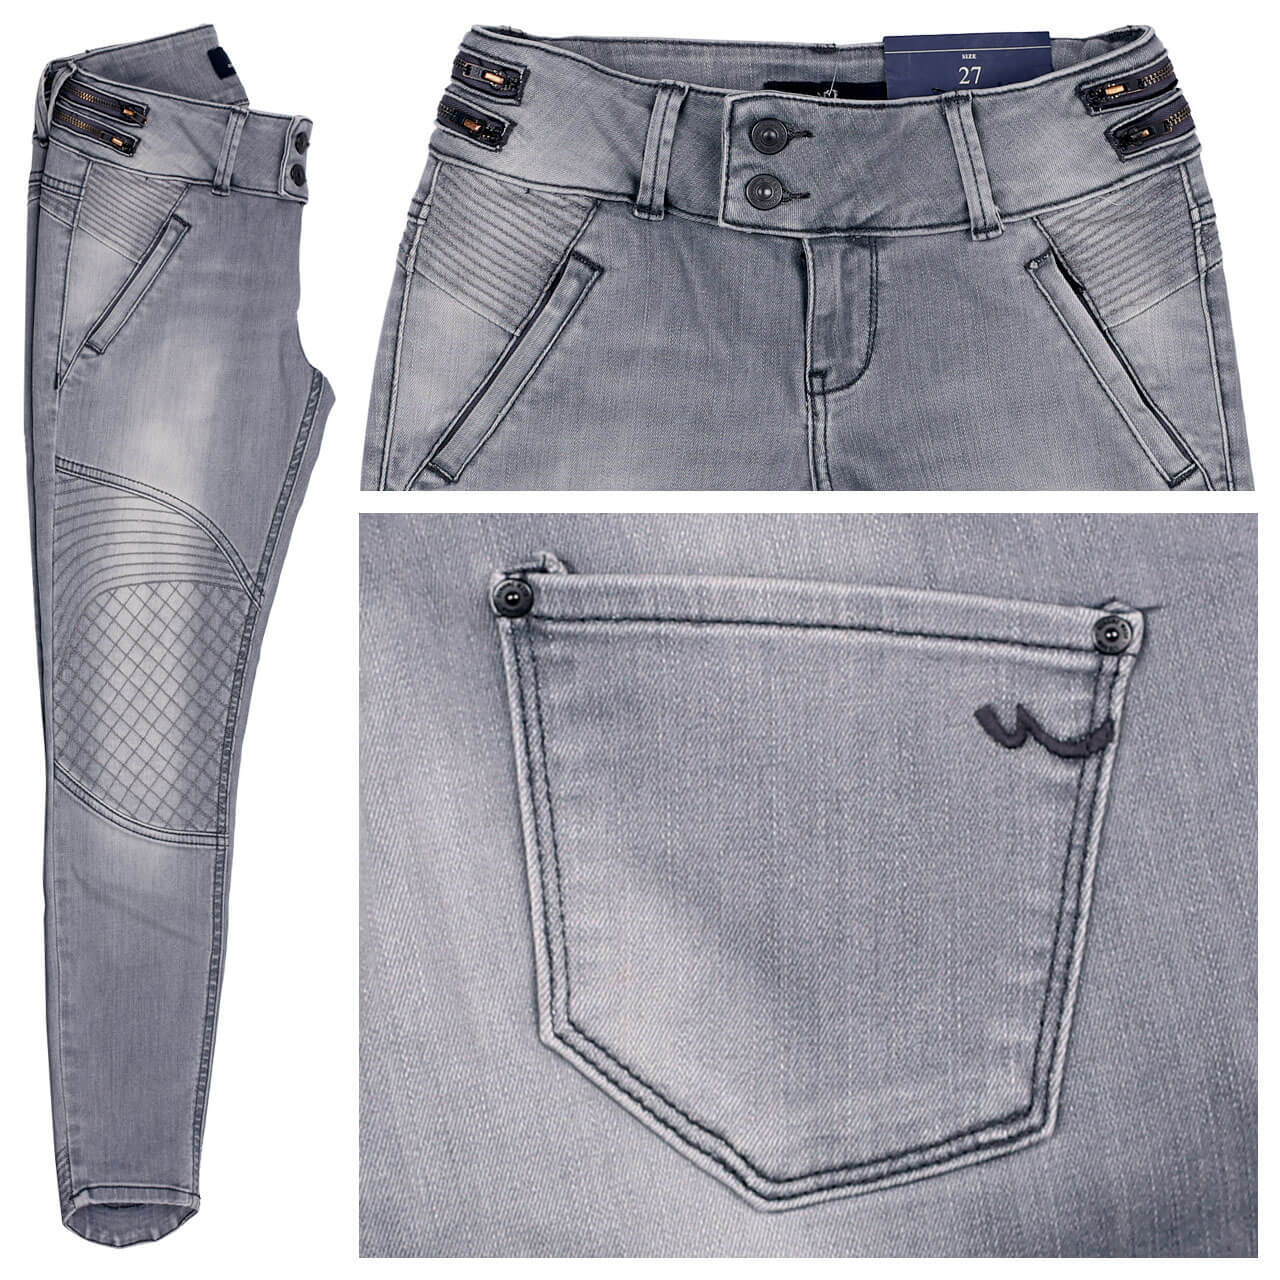 ltb-jeans-briana-greyused-4368